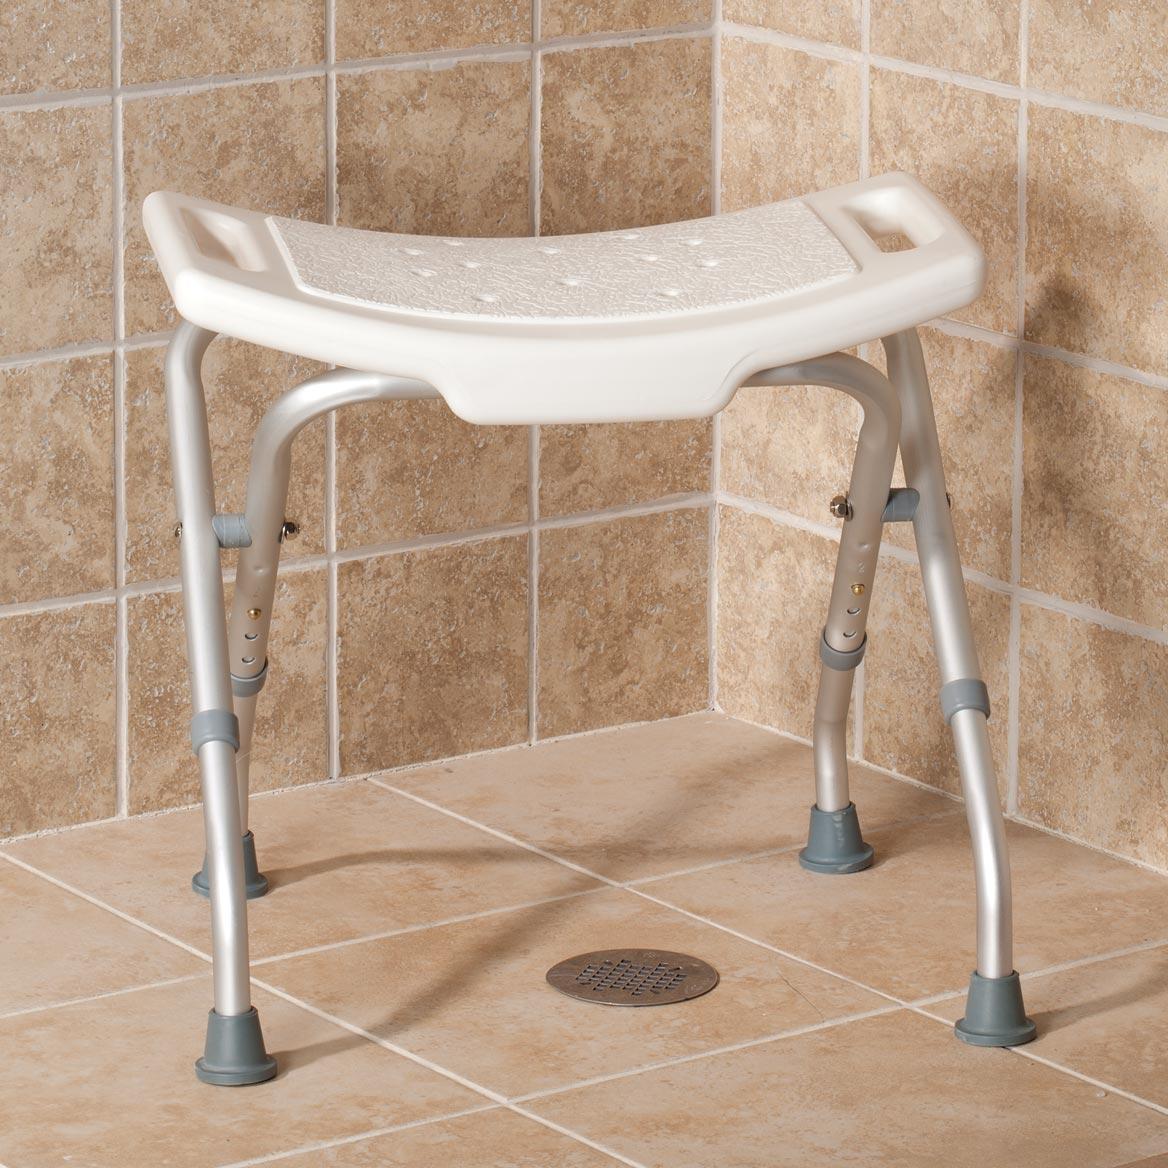 Bathroom Safety - Walter Drake